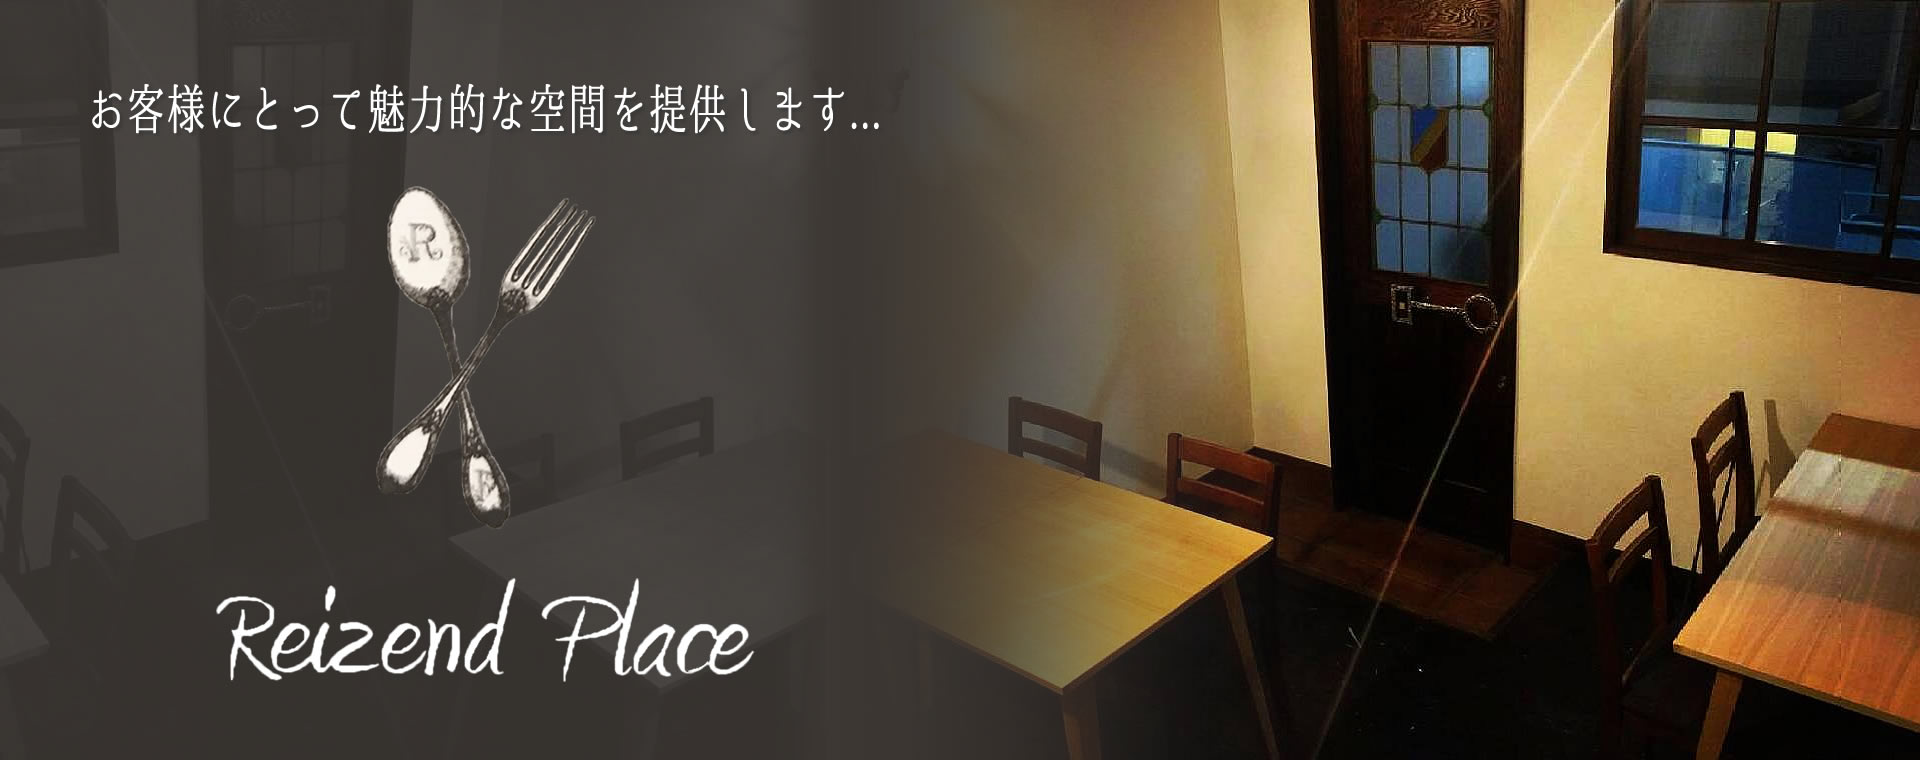 Reizend Place(ライツェントプレイス)